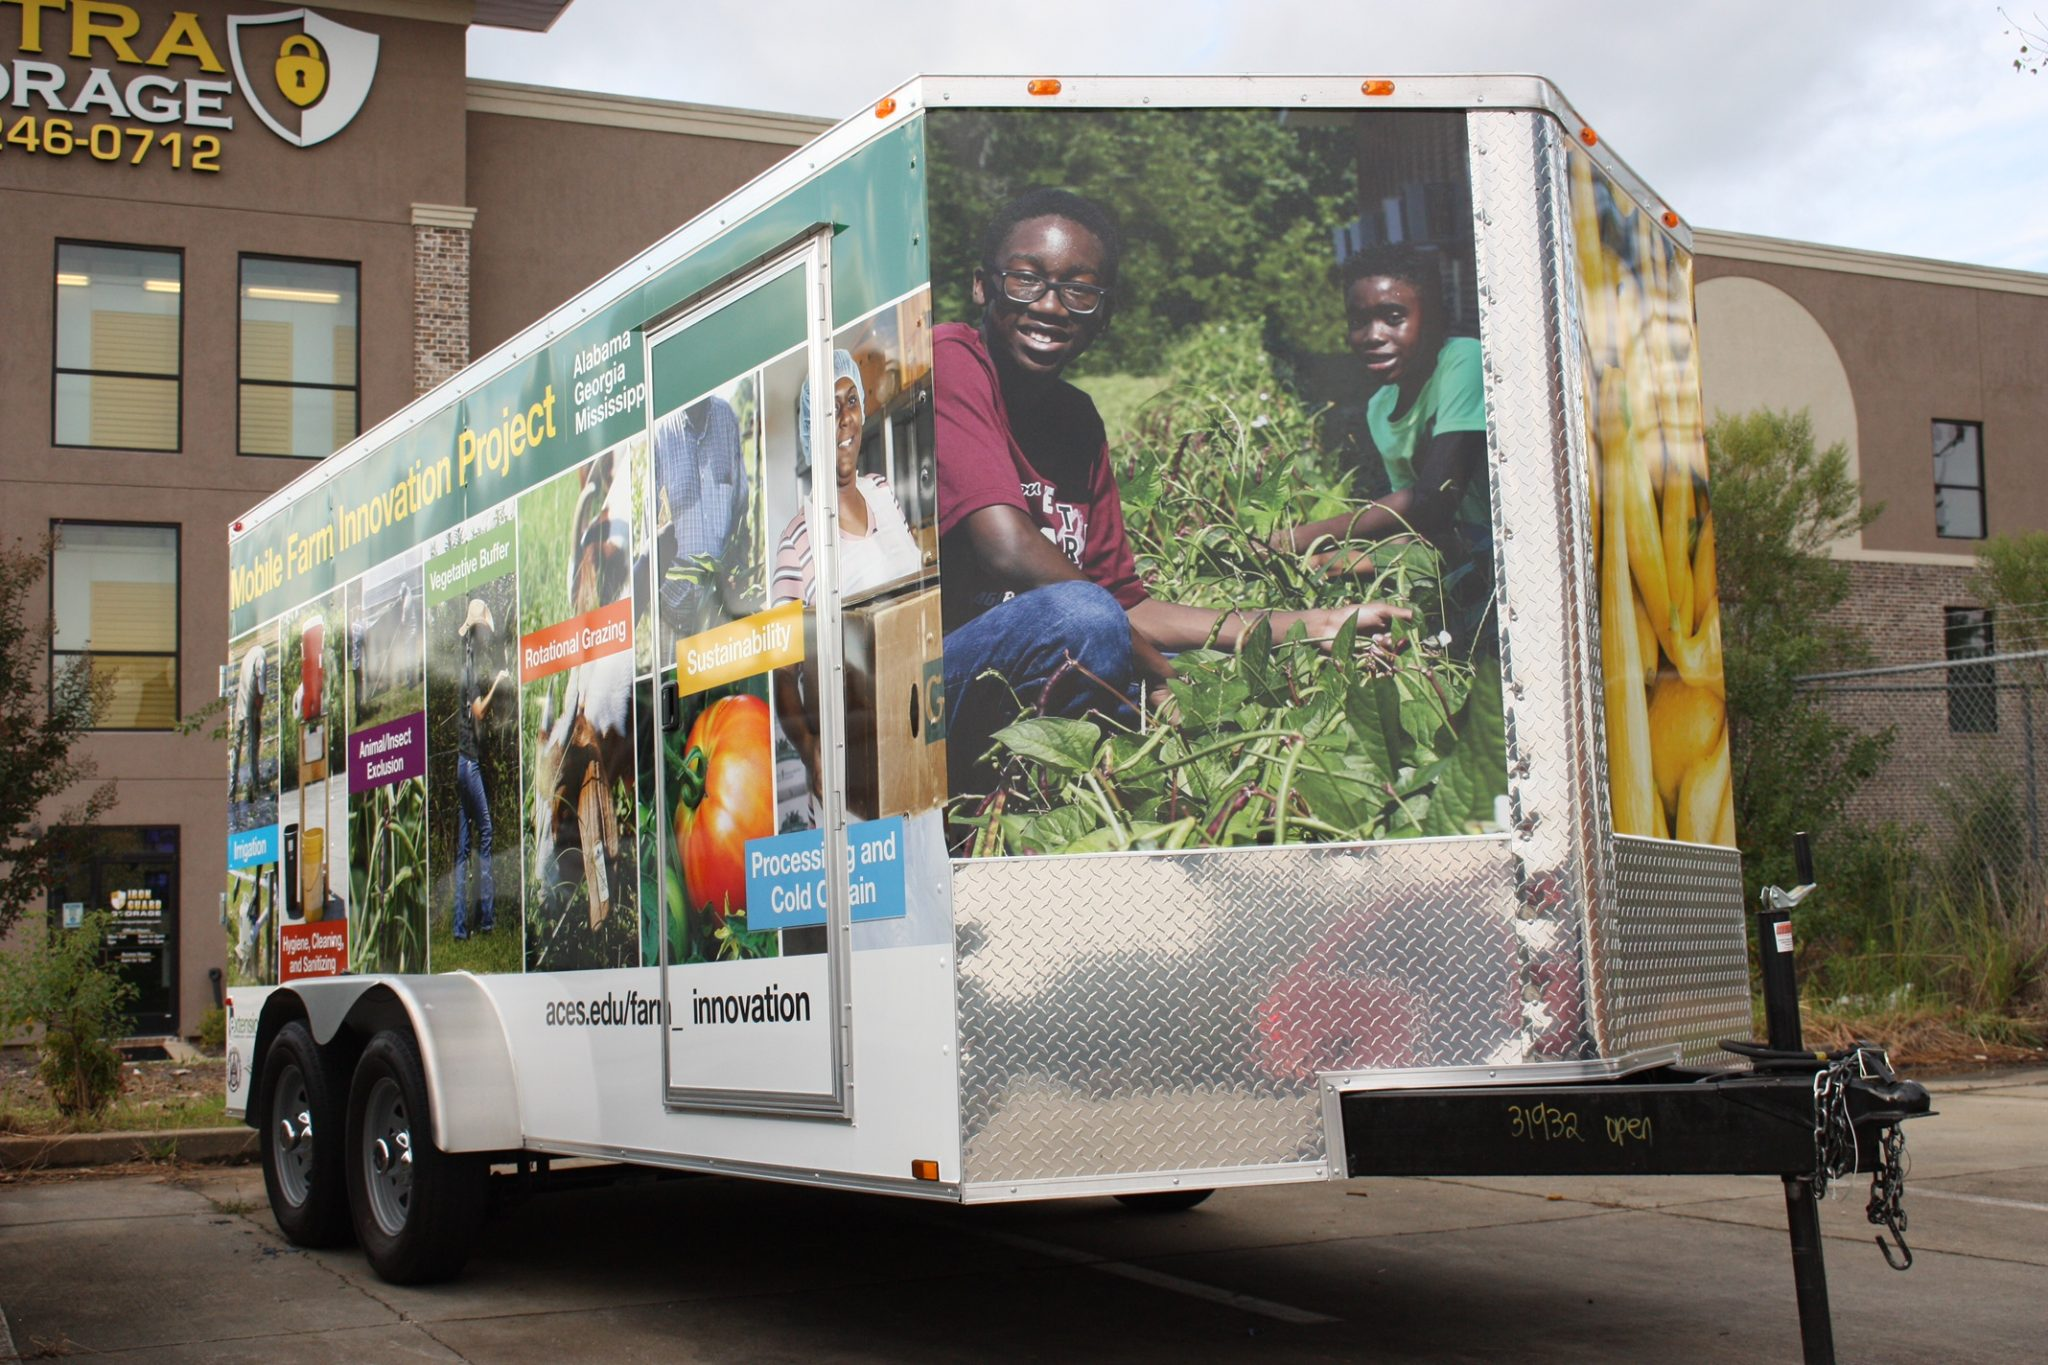 Mobile Farm Innovation Project trailer